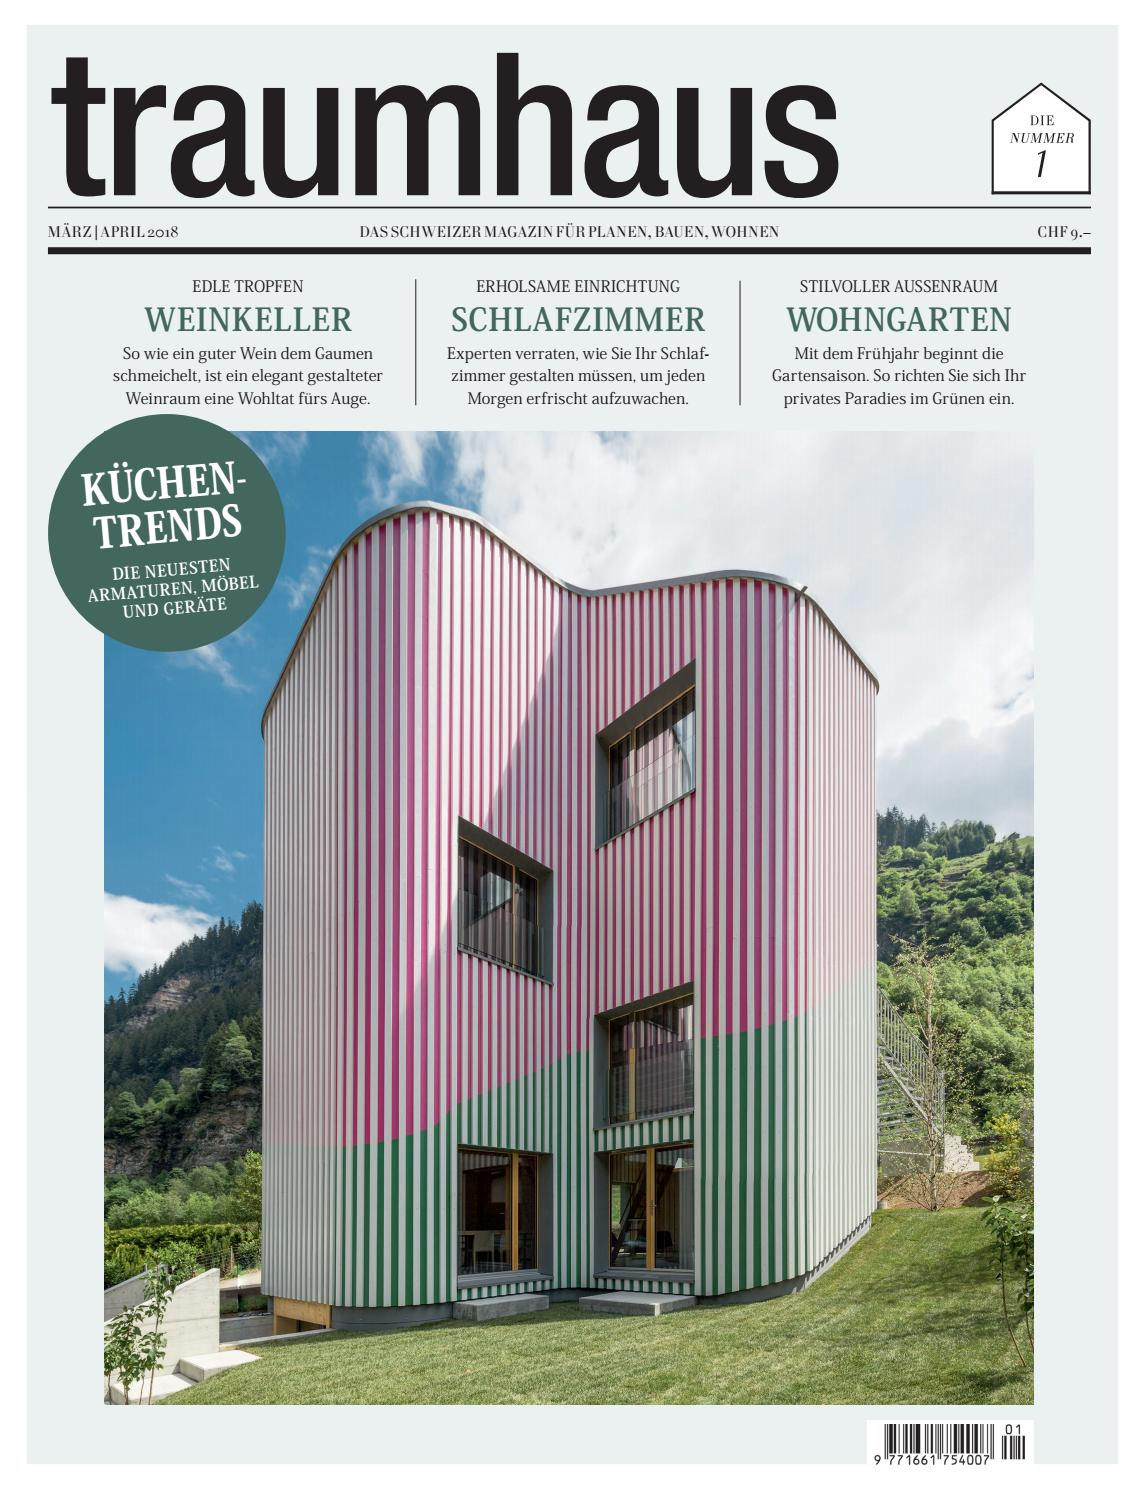 traumhaus 01 2018 by BL Verlag AG - issuu